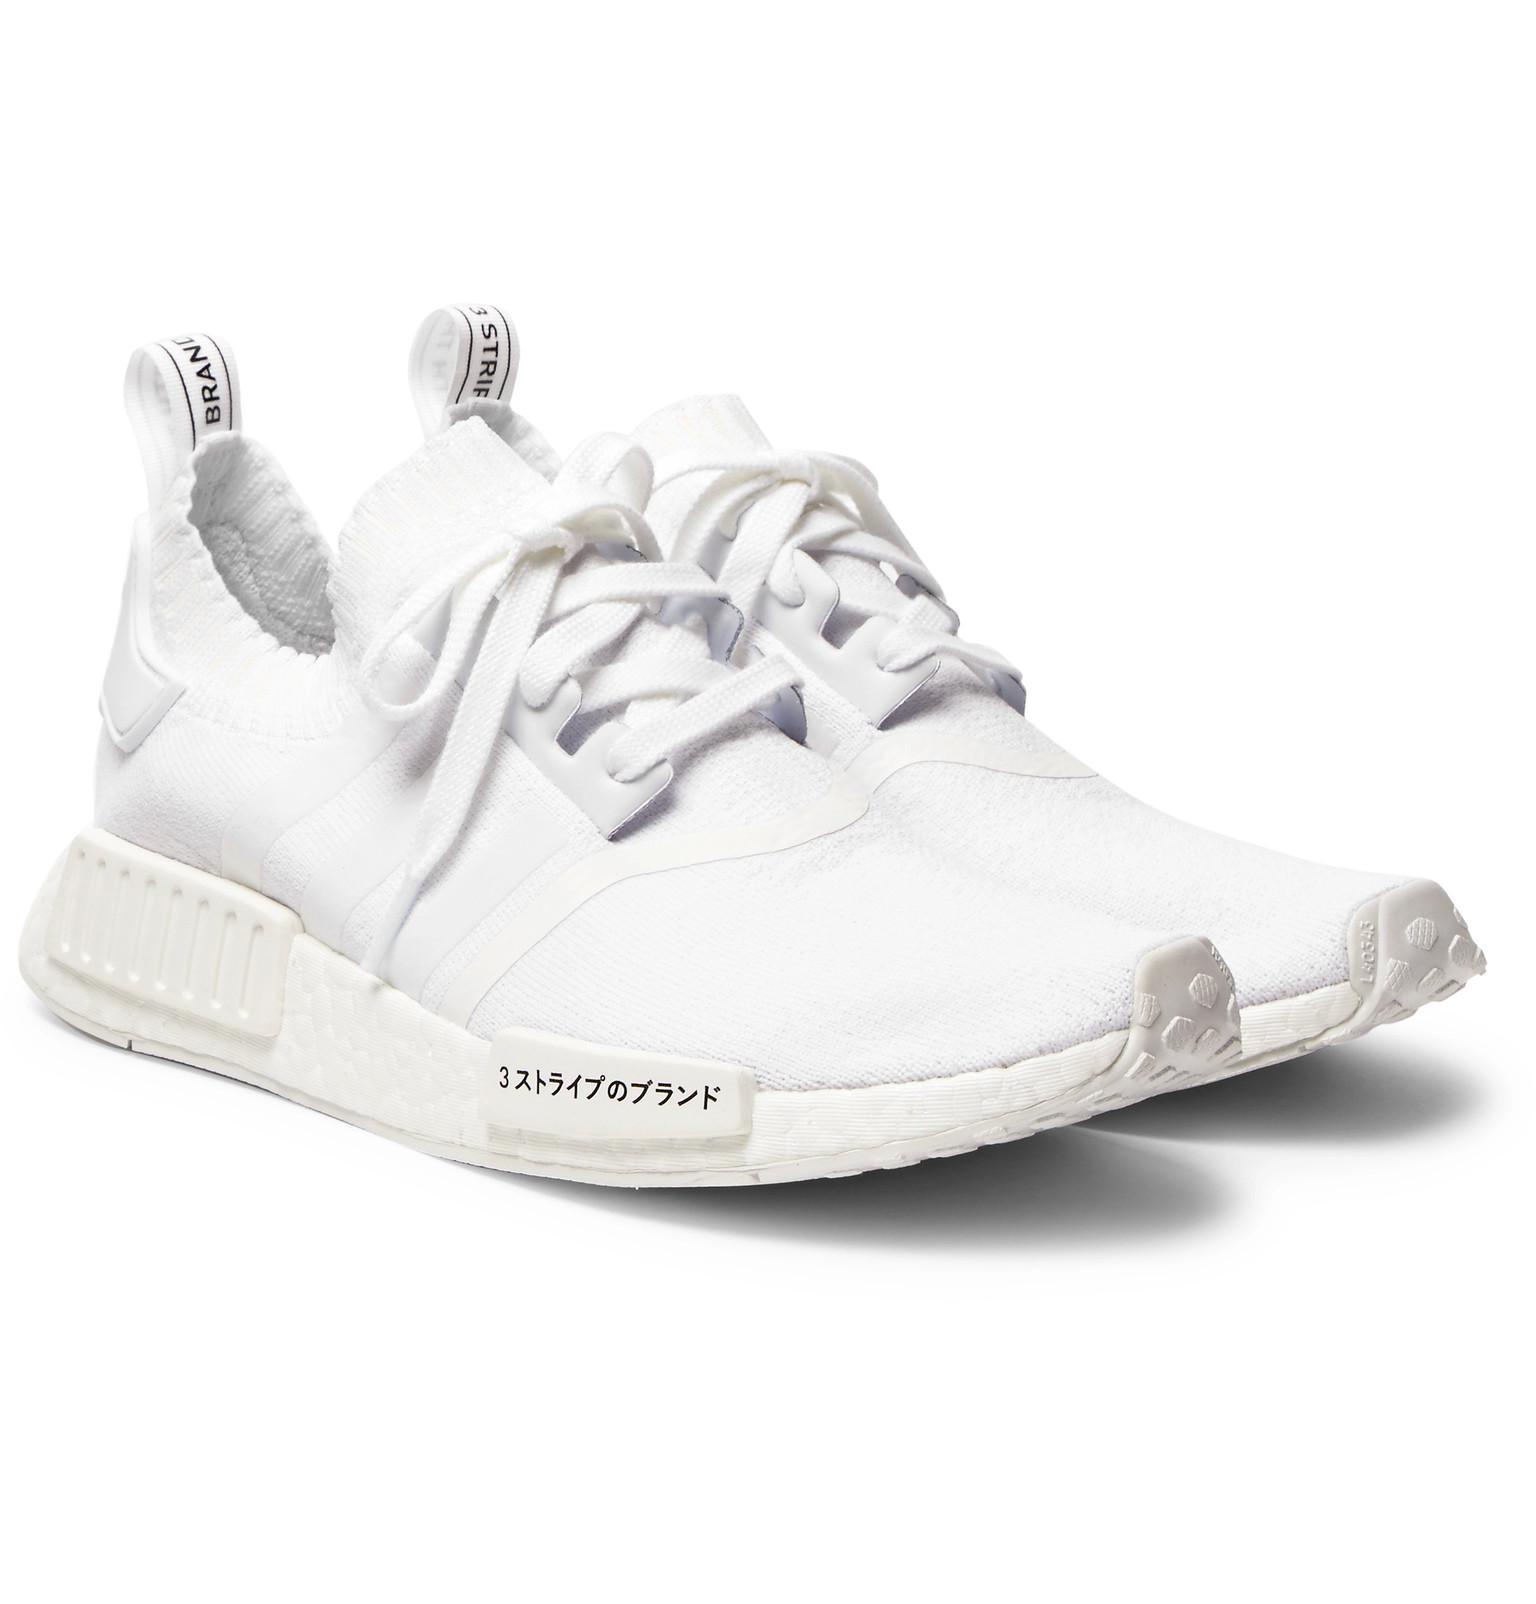 62b08c178 ... czech lyst adidas originals nmd r1 primeknit sneakers in white for men  9e3e4 fdca9